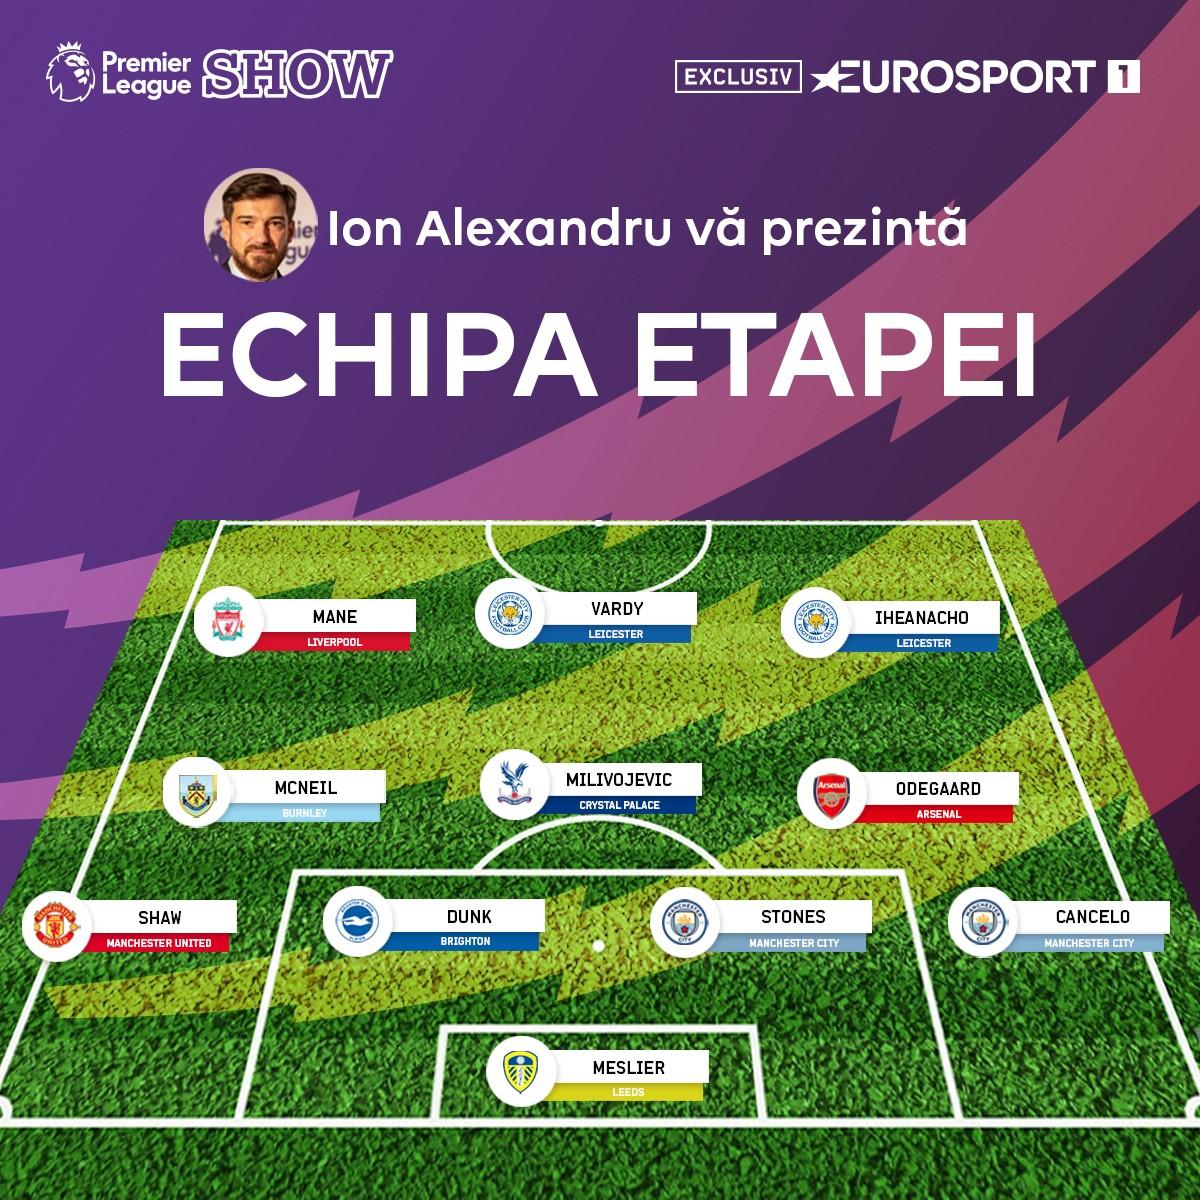 https://i.eurosport.com/2021/03/16/3012579.jpg